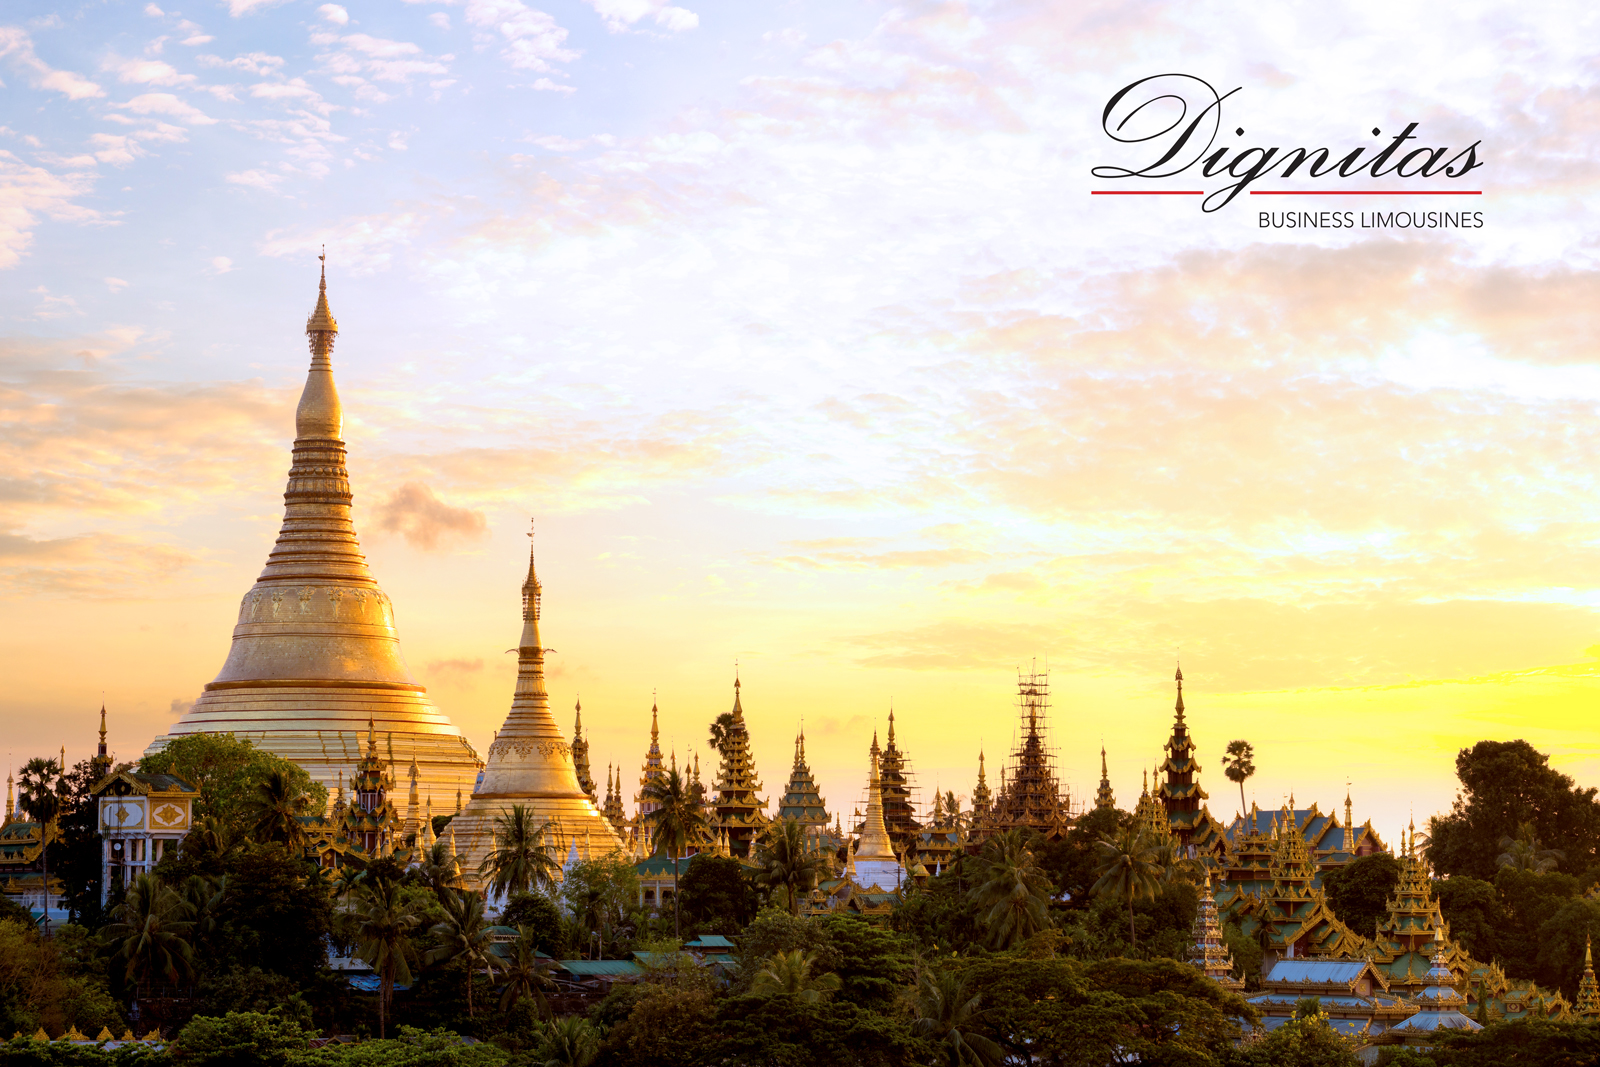 The Shwedagon Pagoda located in Yangon, Myanmar.